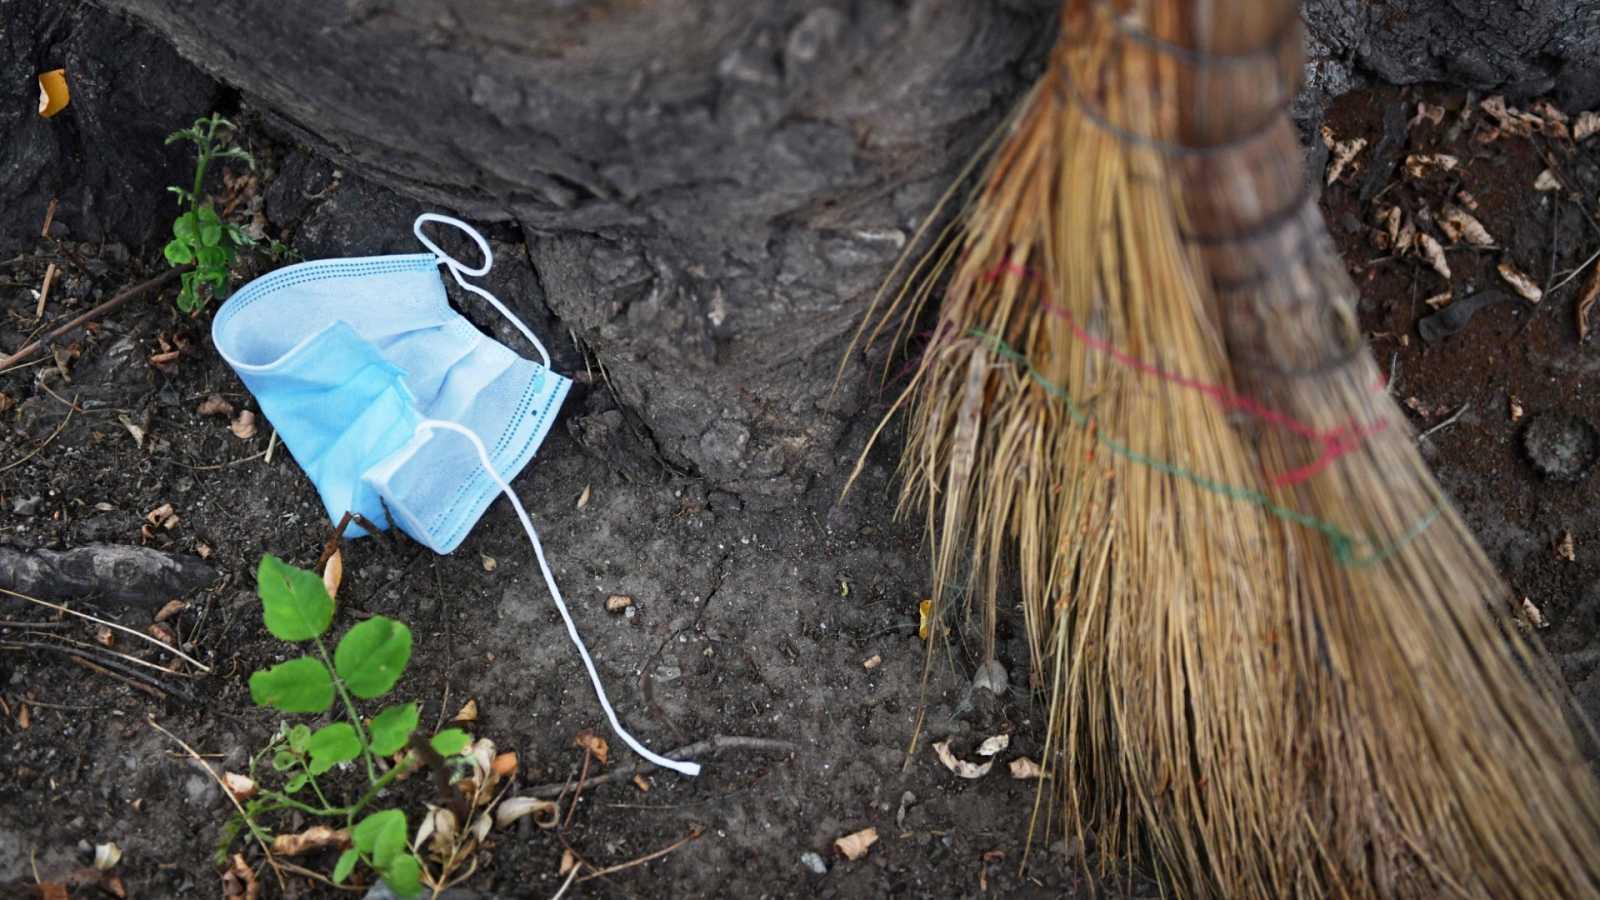 En Directe a Ràdio 4 - Vida Verda: Augment desmesurat de residus sanitaris